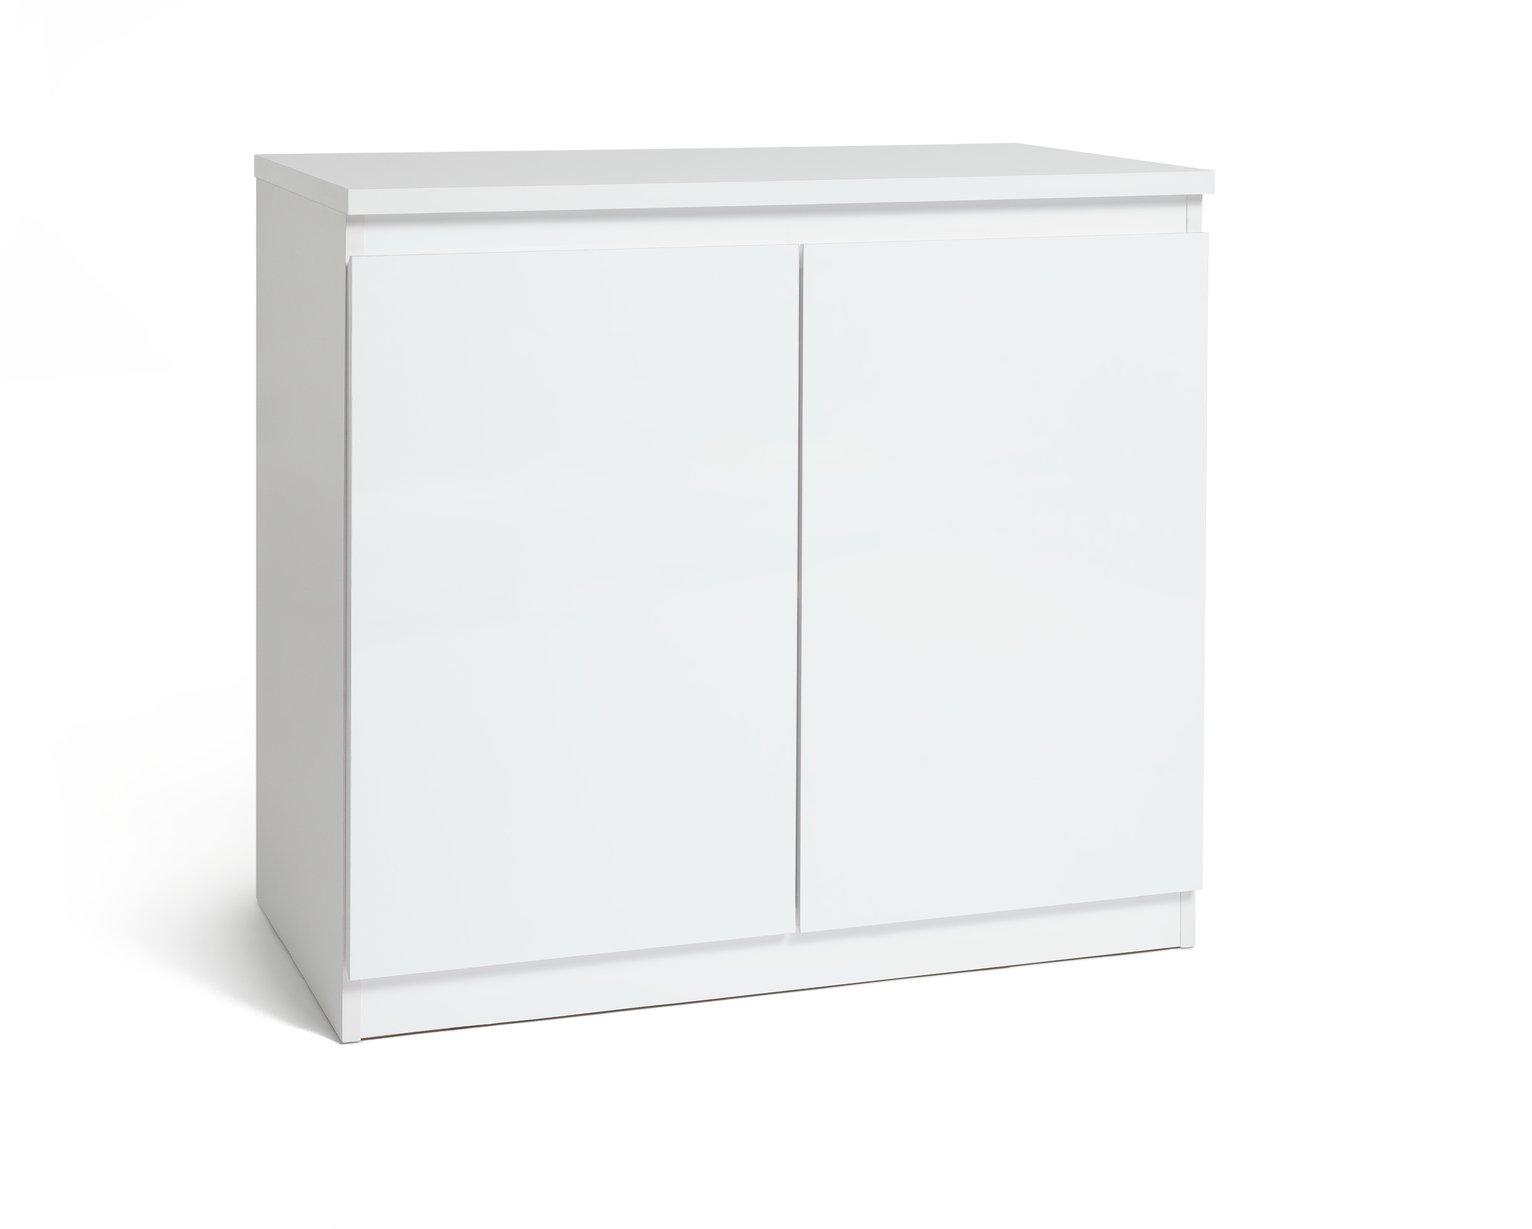 Habitat Jenson 2 Door Sideboard - White